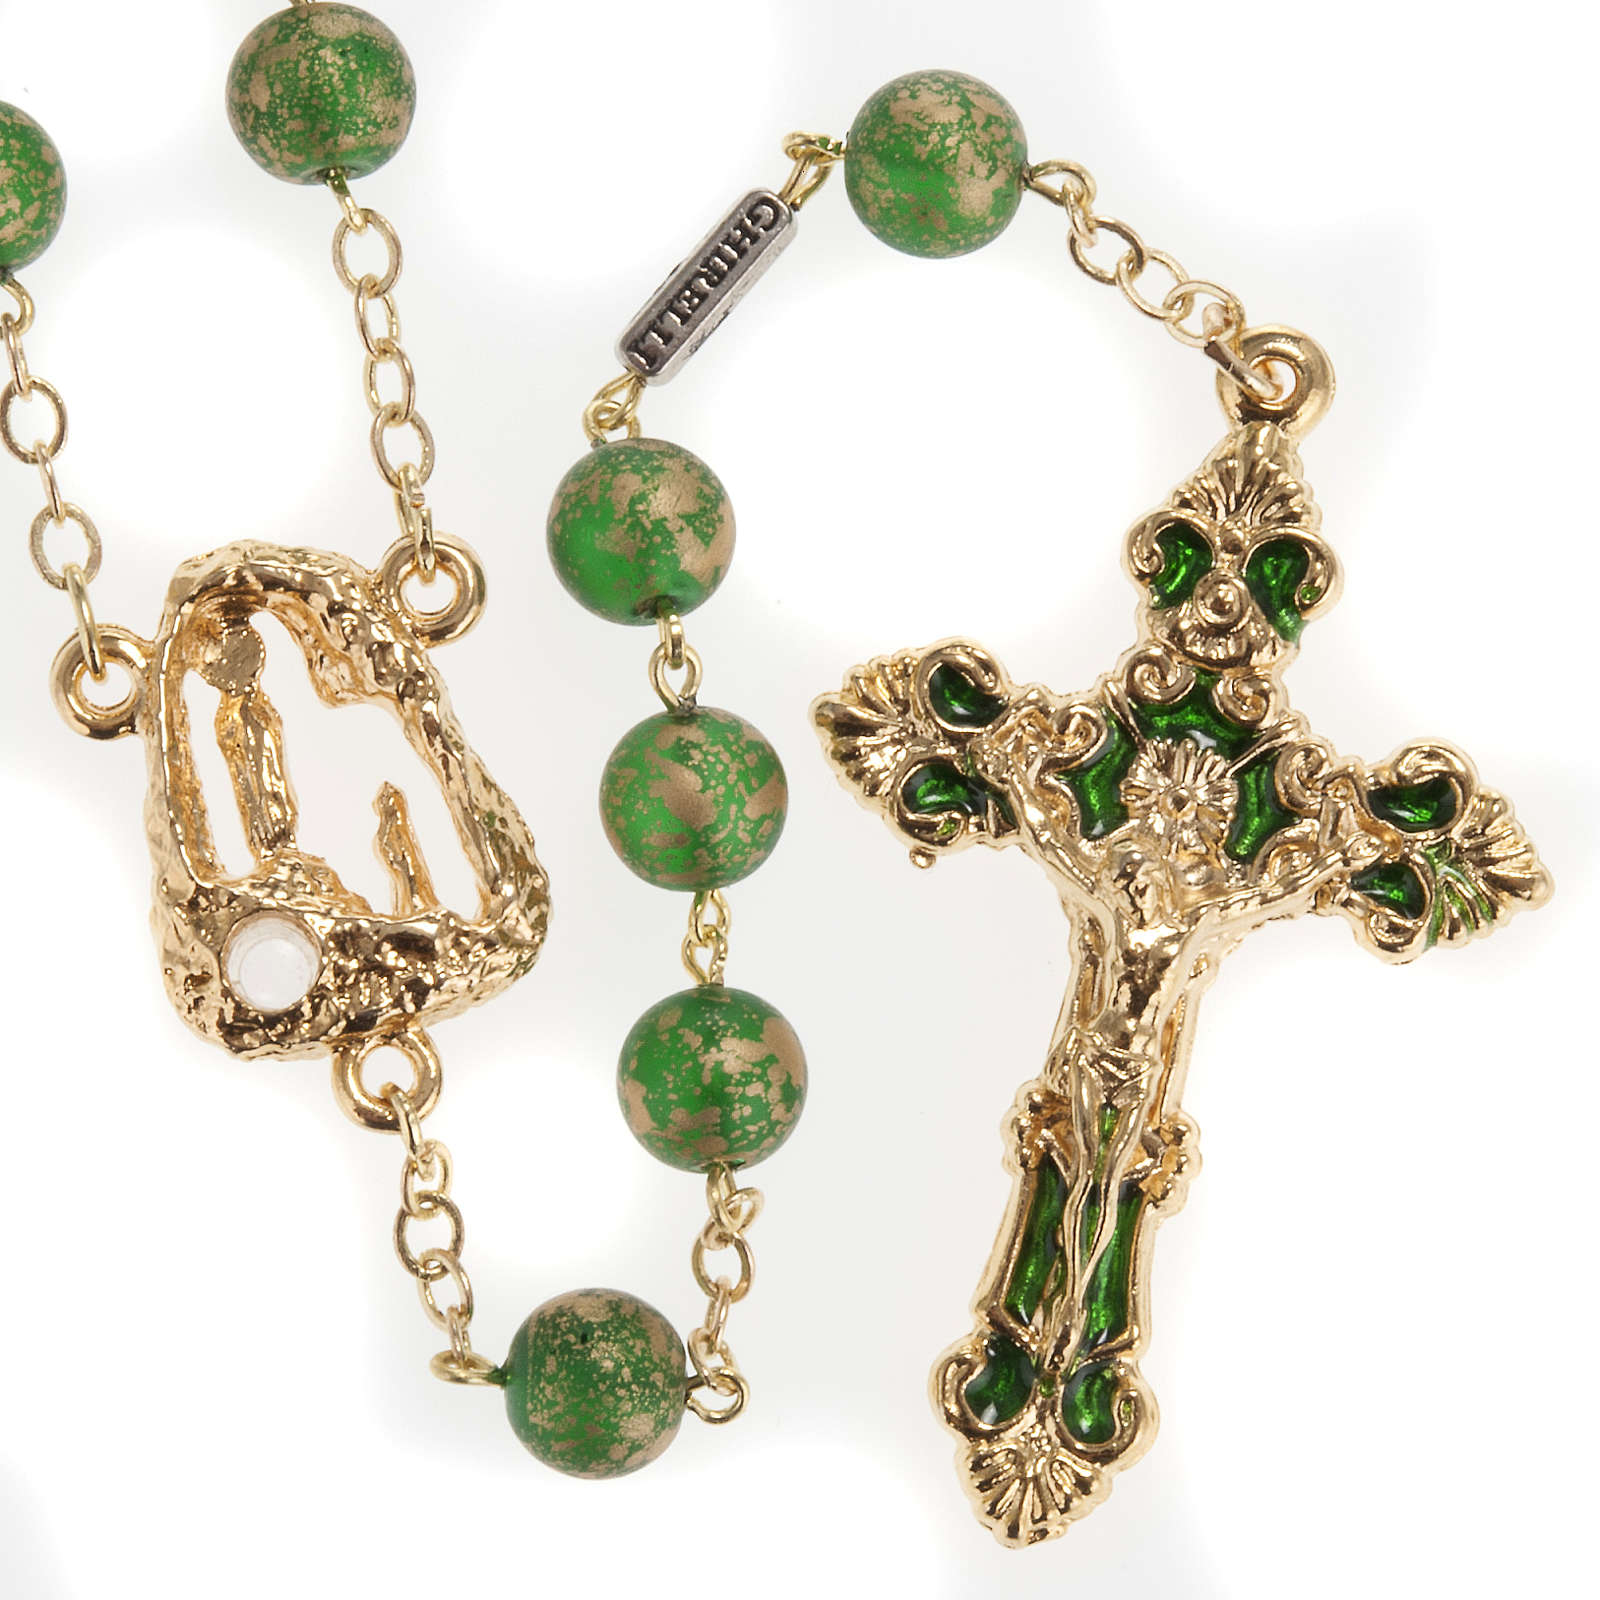 Ghirelli rosary Lourdes Grotto, green-golden 8mm 4